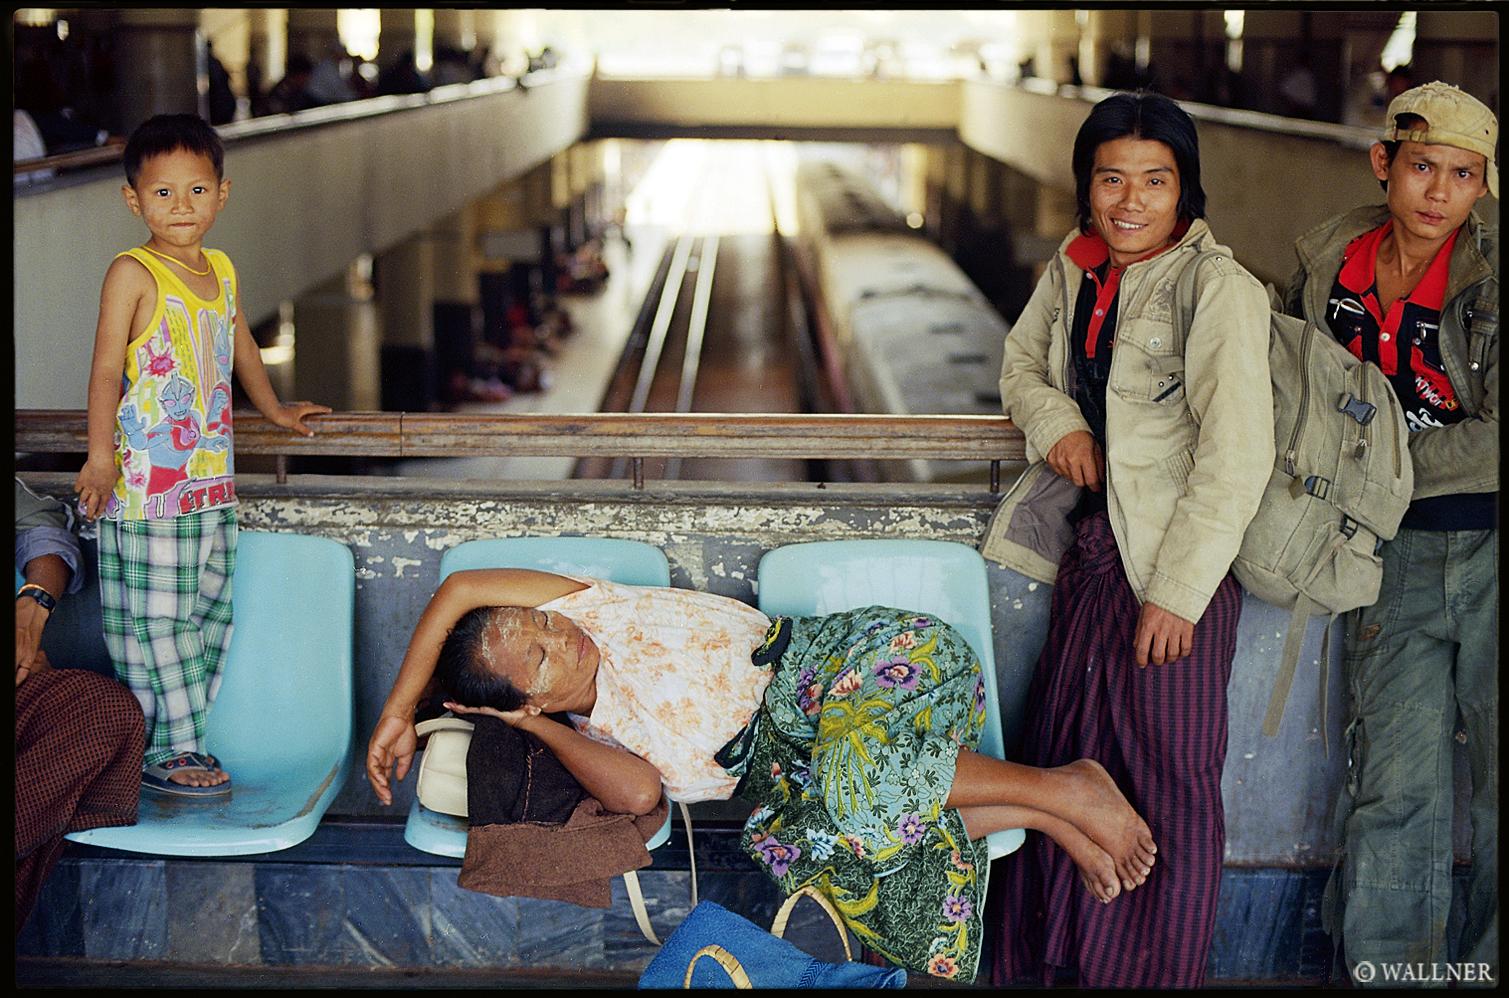 35mmPatrikWallner_Mandalay_TrainStationWaitingLOWQ